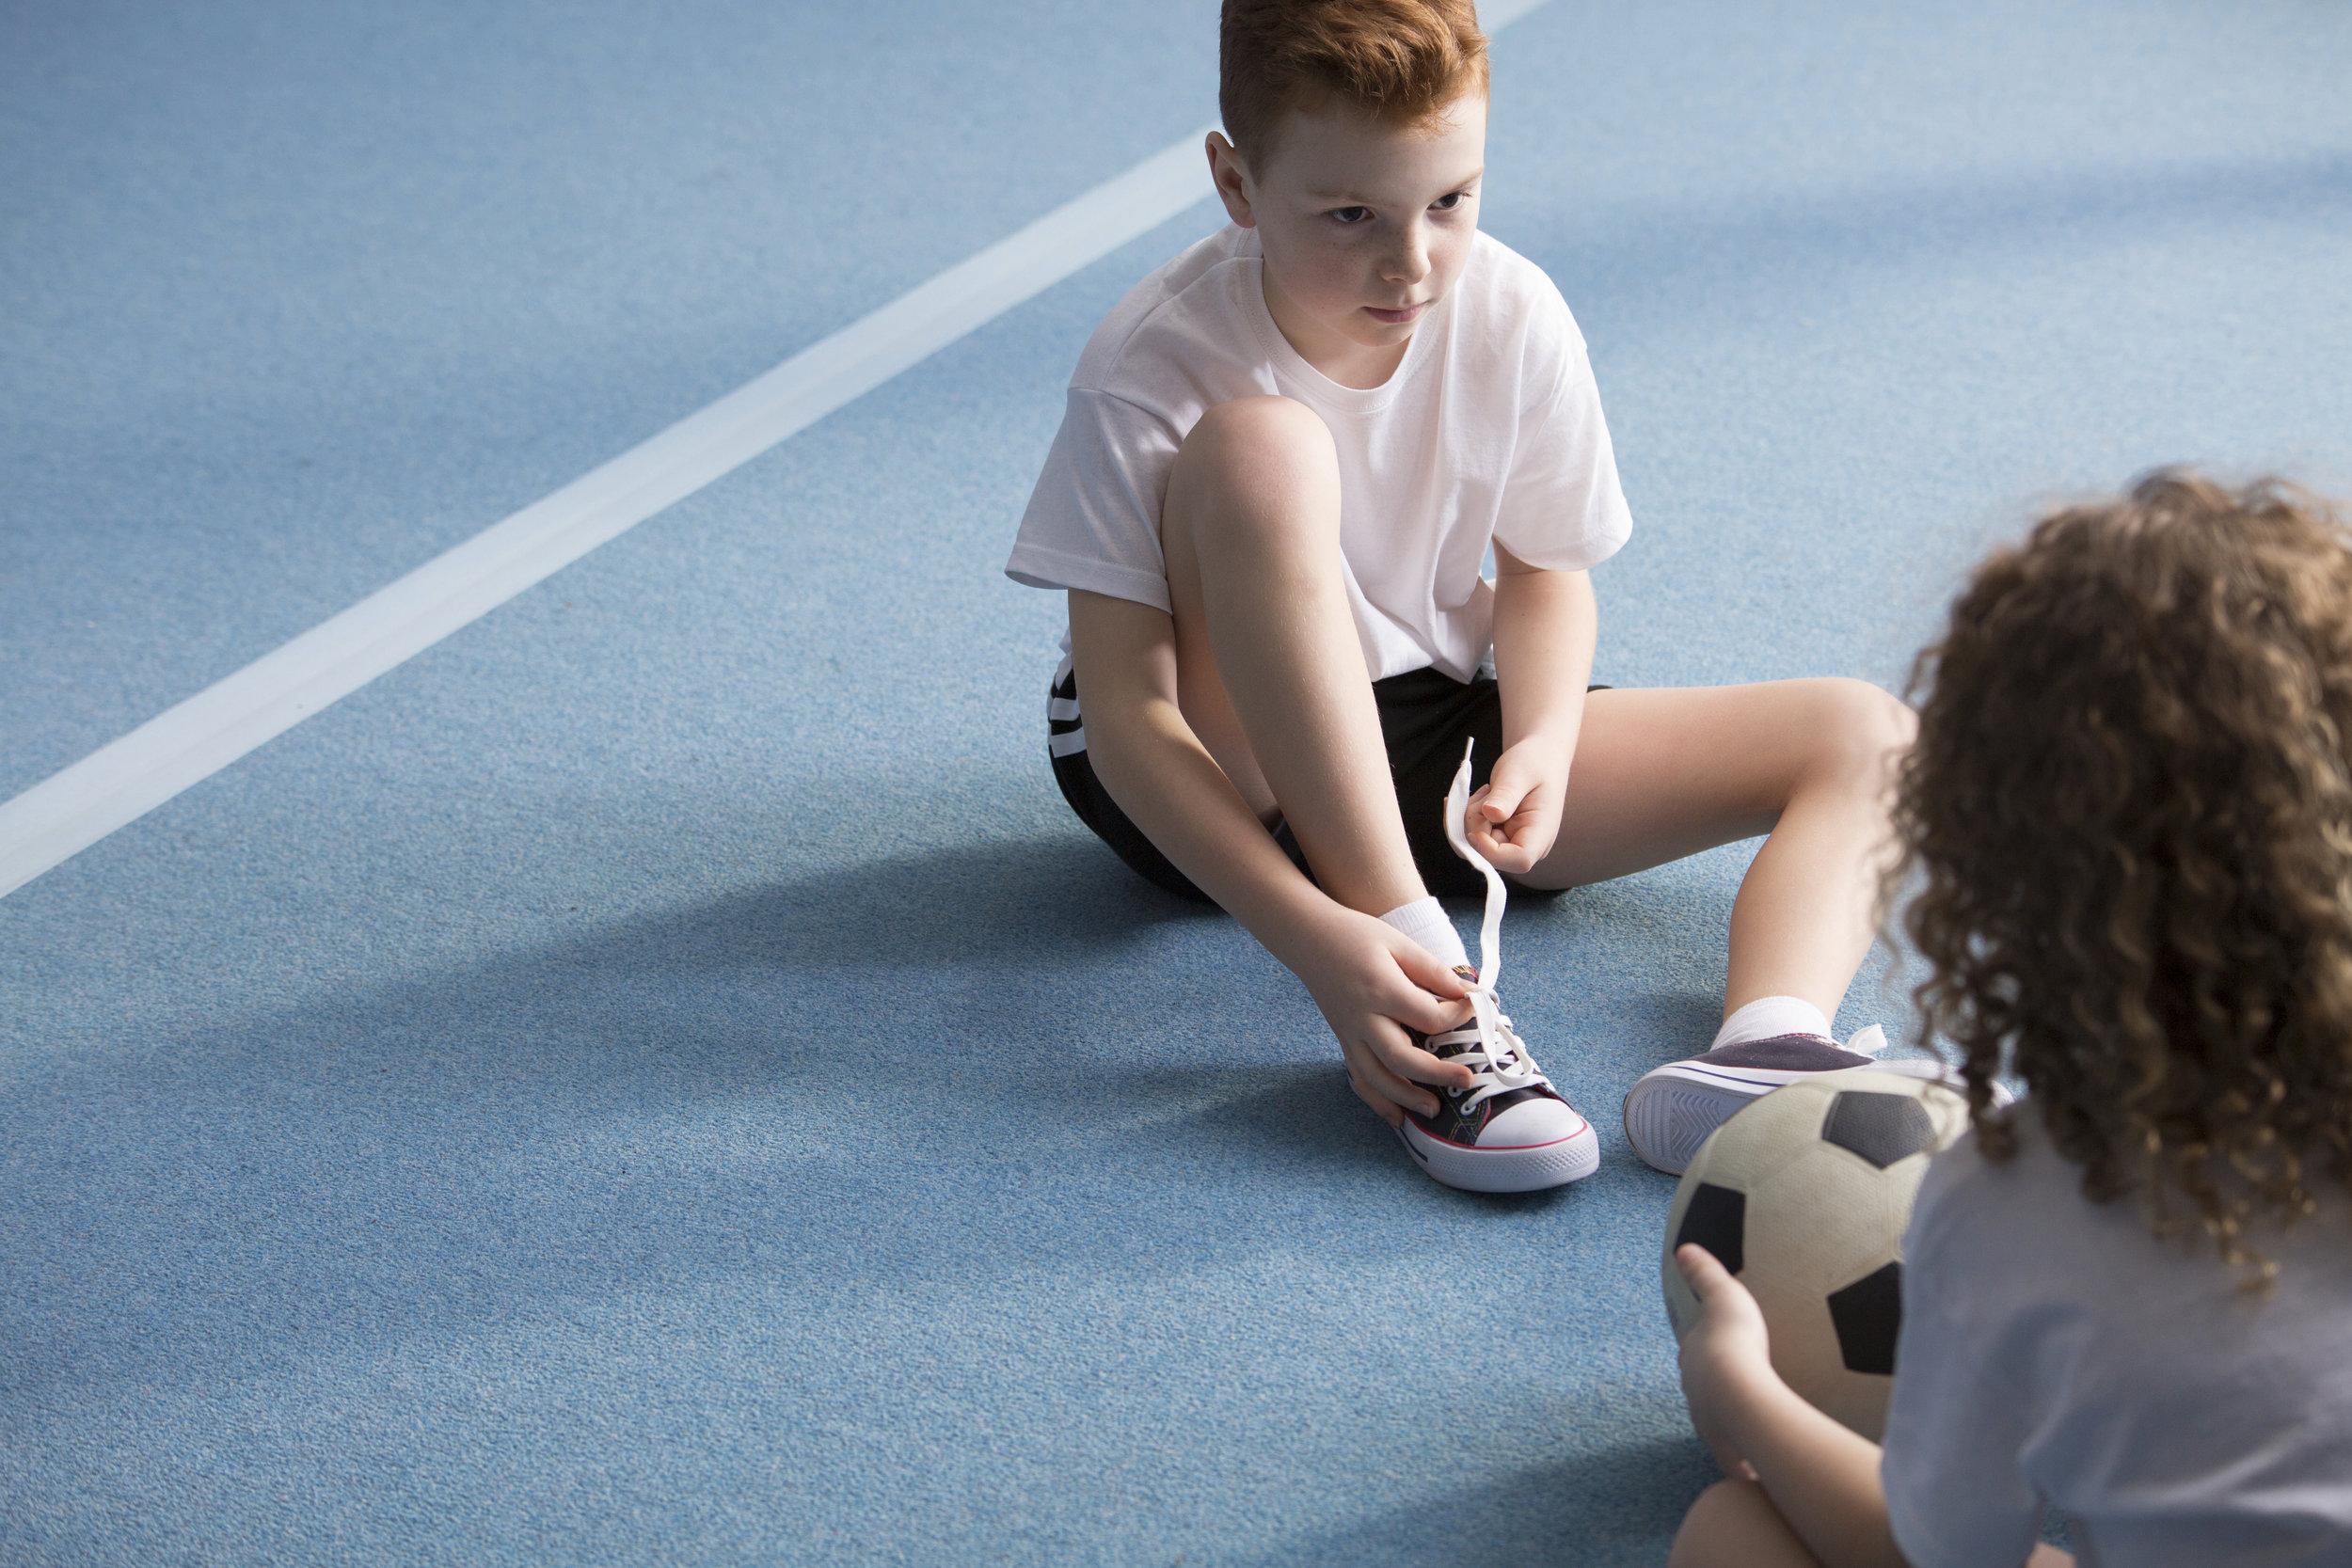 young-boy-tying-sport-shoes-F2L5H4C.jpg